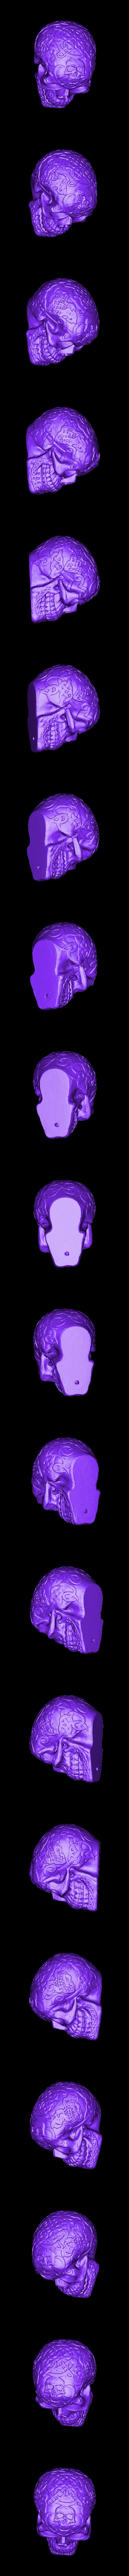 0_Plastic_skull20120823-2-cqmm6s.stl Download free STL file Celtic Skull • 3D printer template, Plonumarr